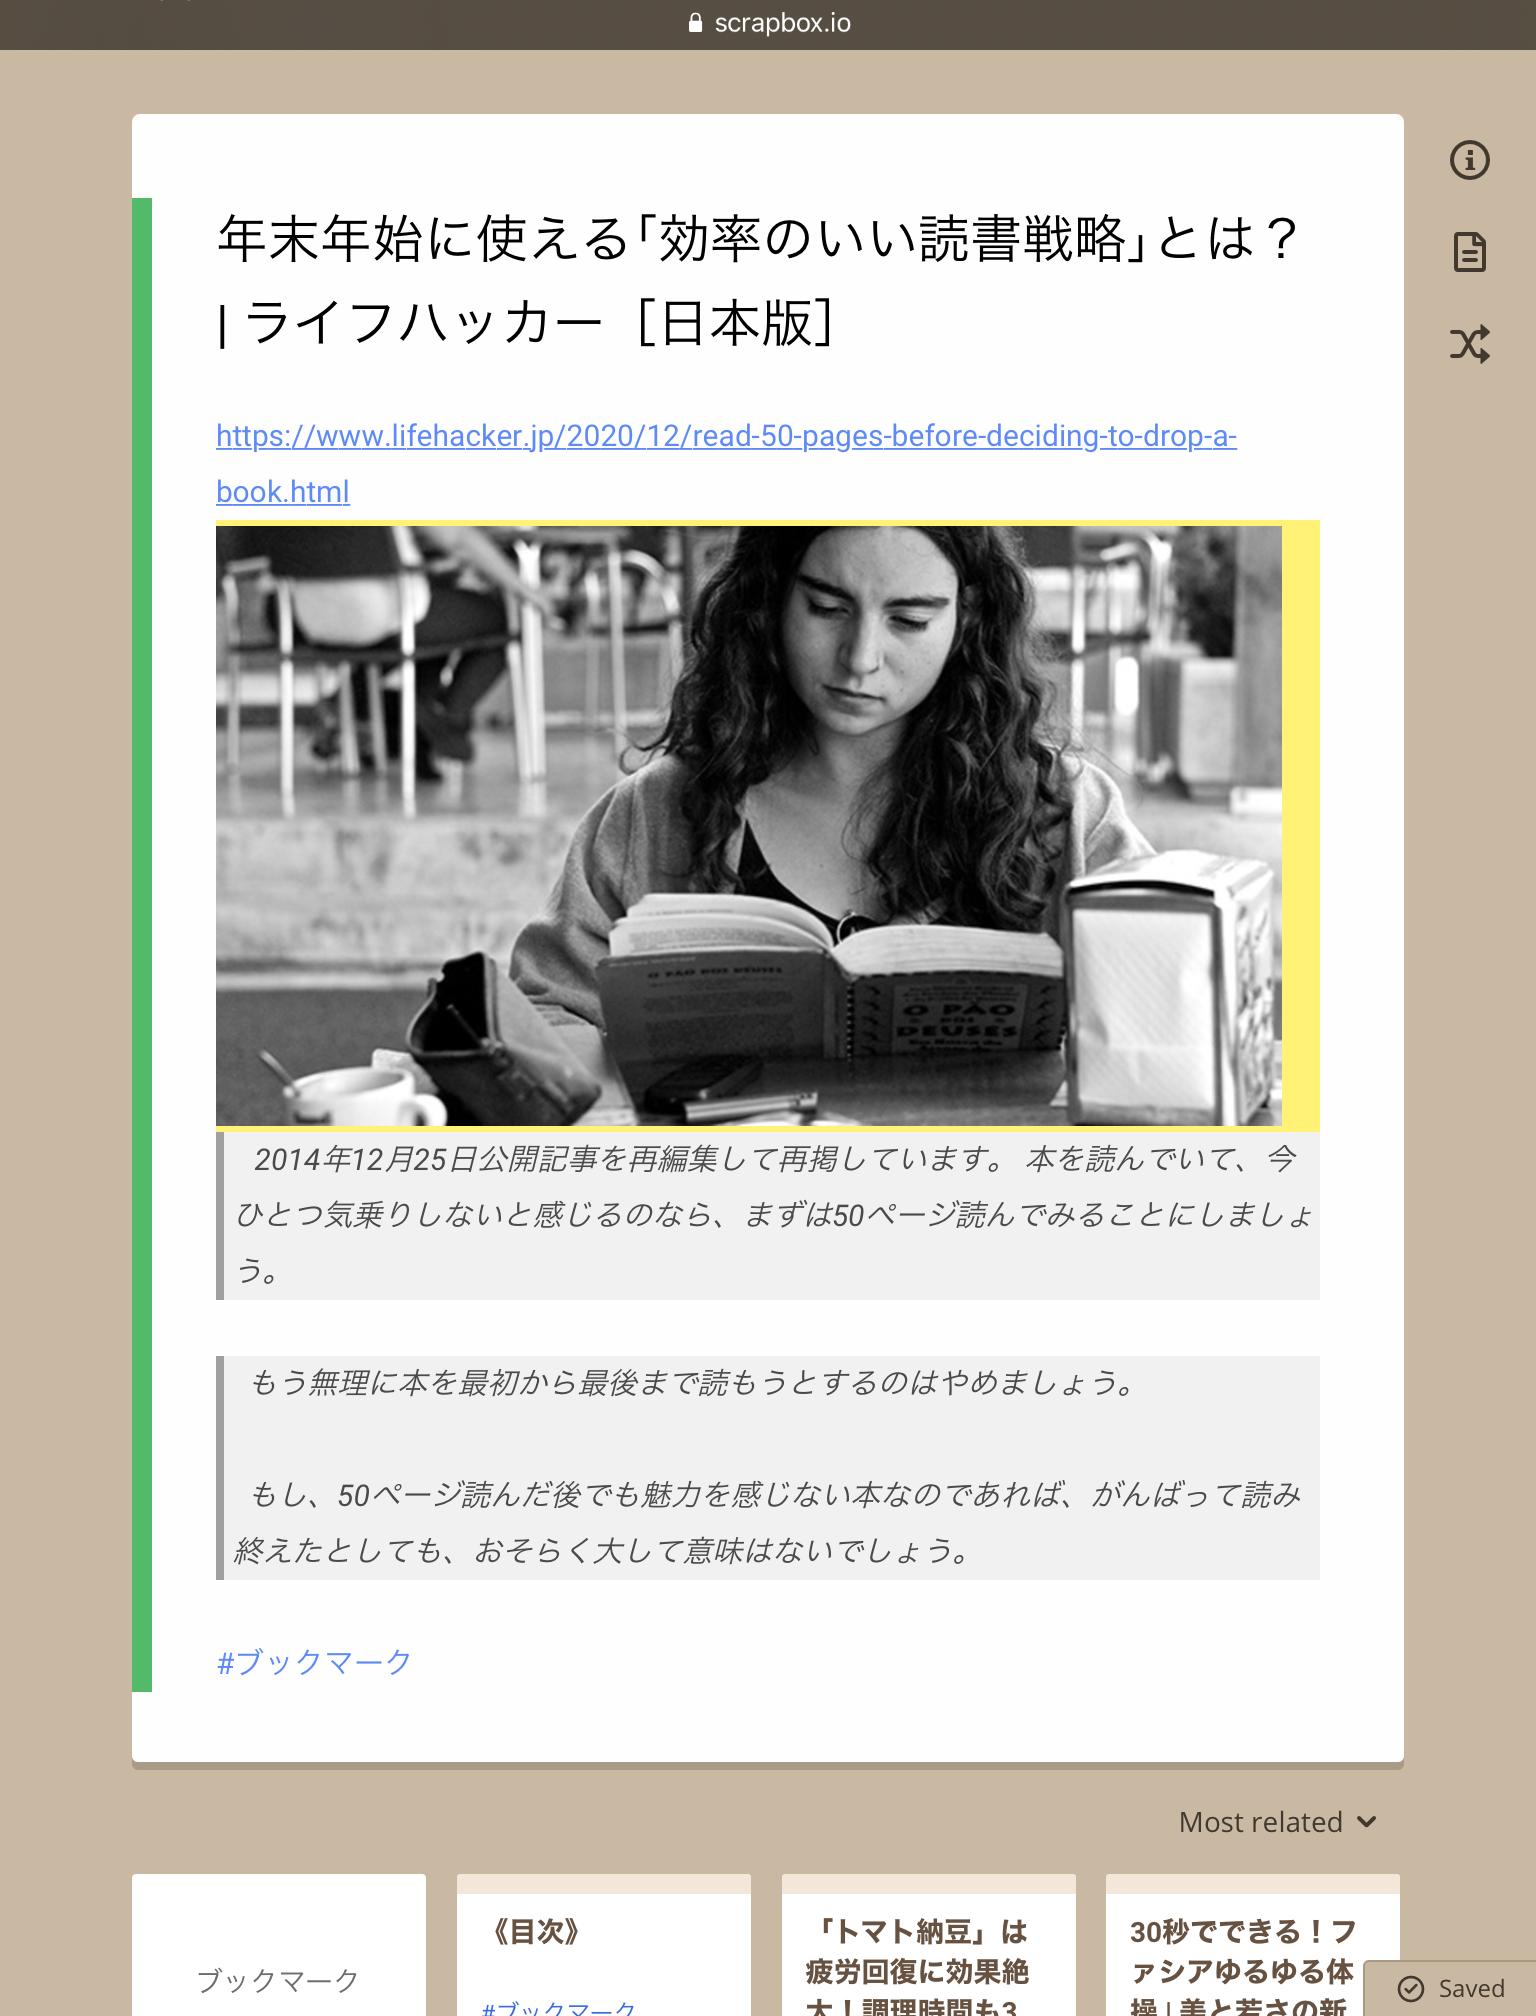 f:id:sorashima:20210105014952p:plain:w637